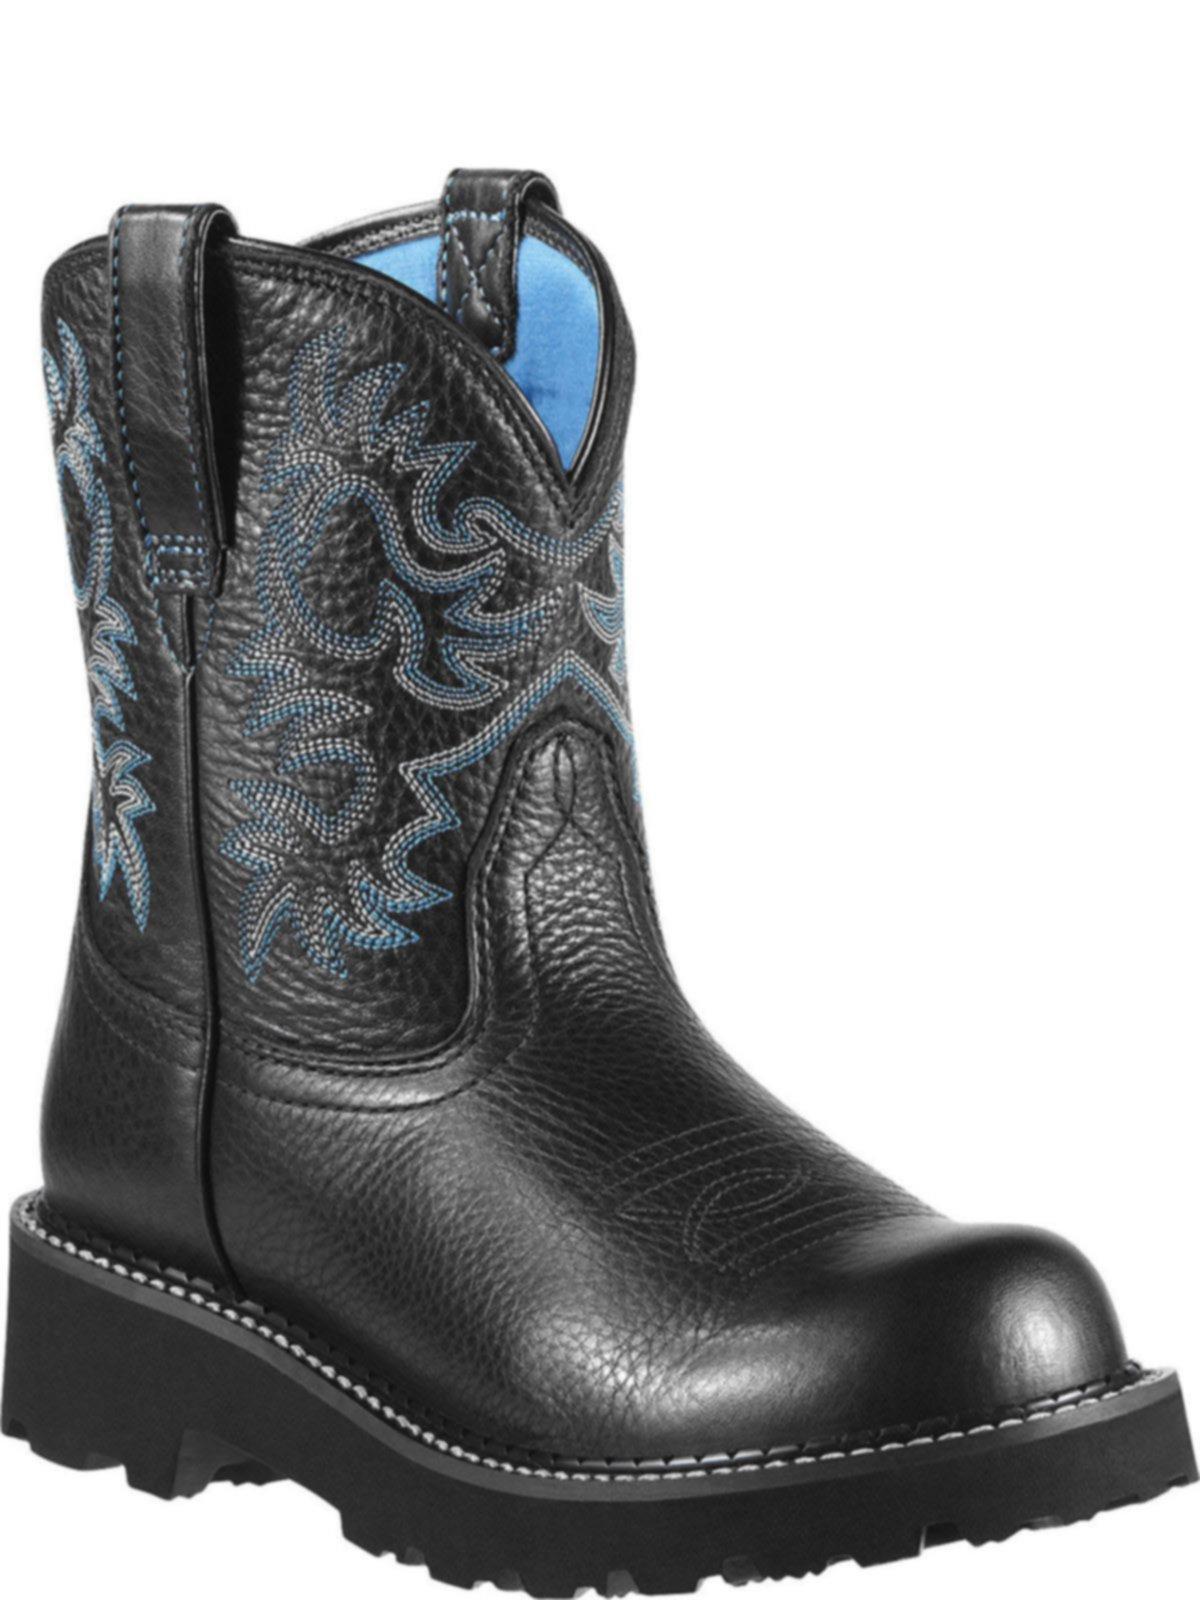 bootamerica ariat womens fatbaby black deertan boot 10000833